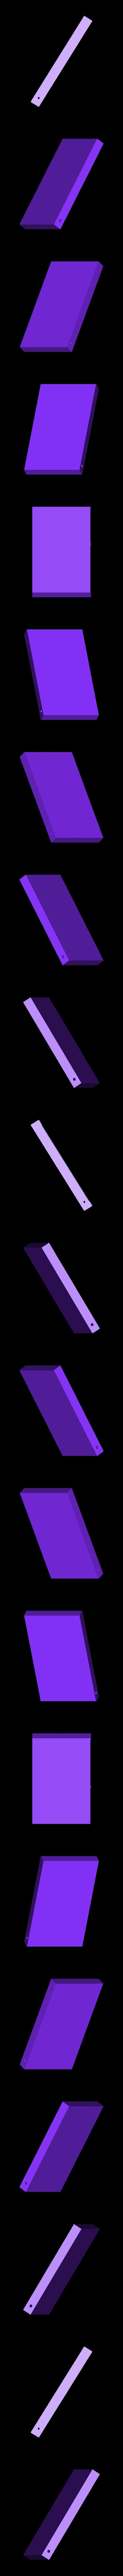 assemblage etlv - languette-2.STL Download free STL file Oragamizer • 3D printer model, Hell_Fire